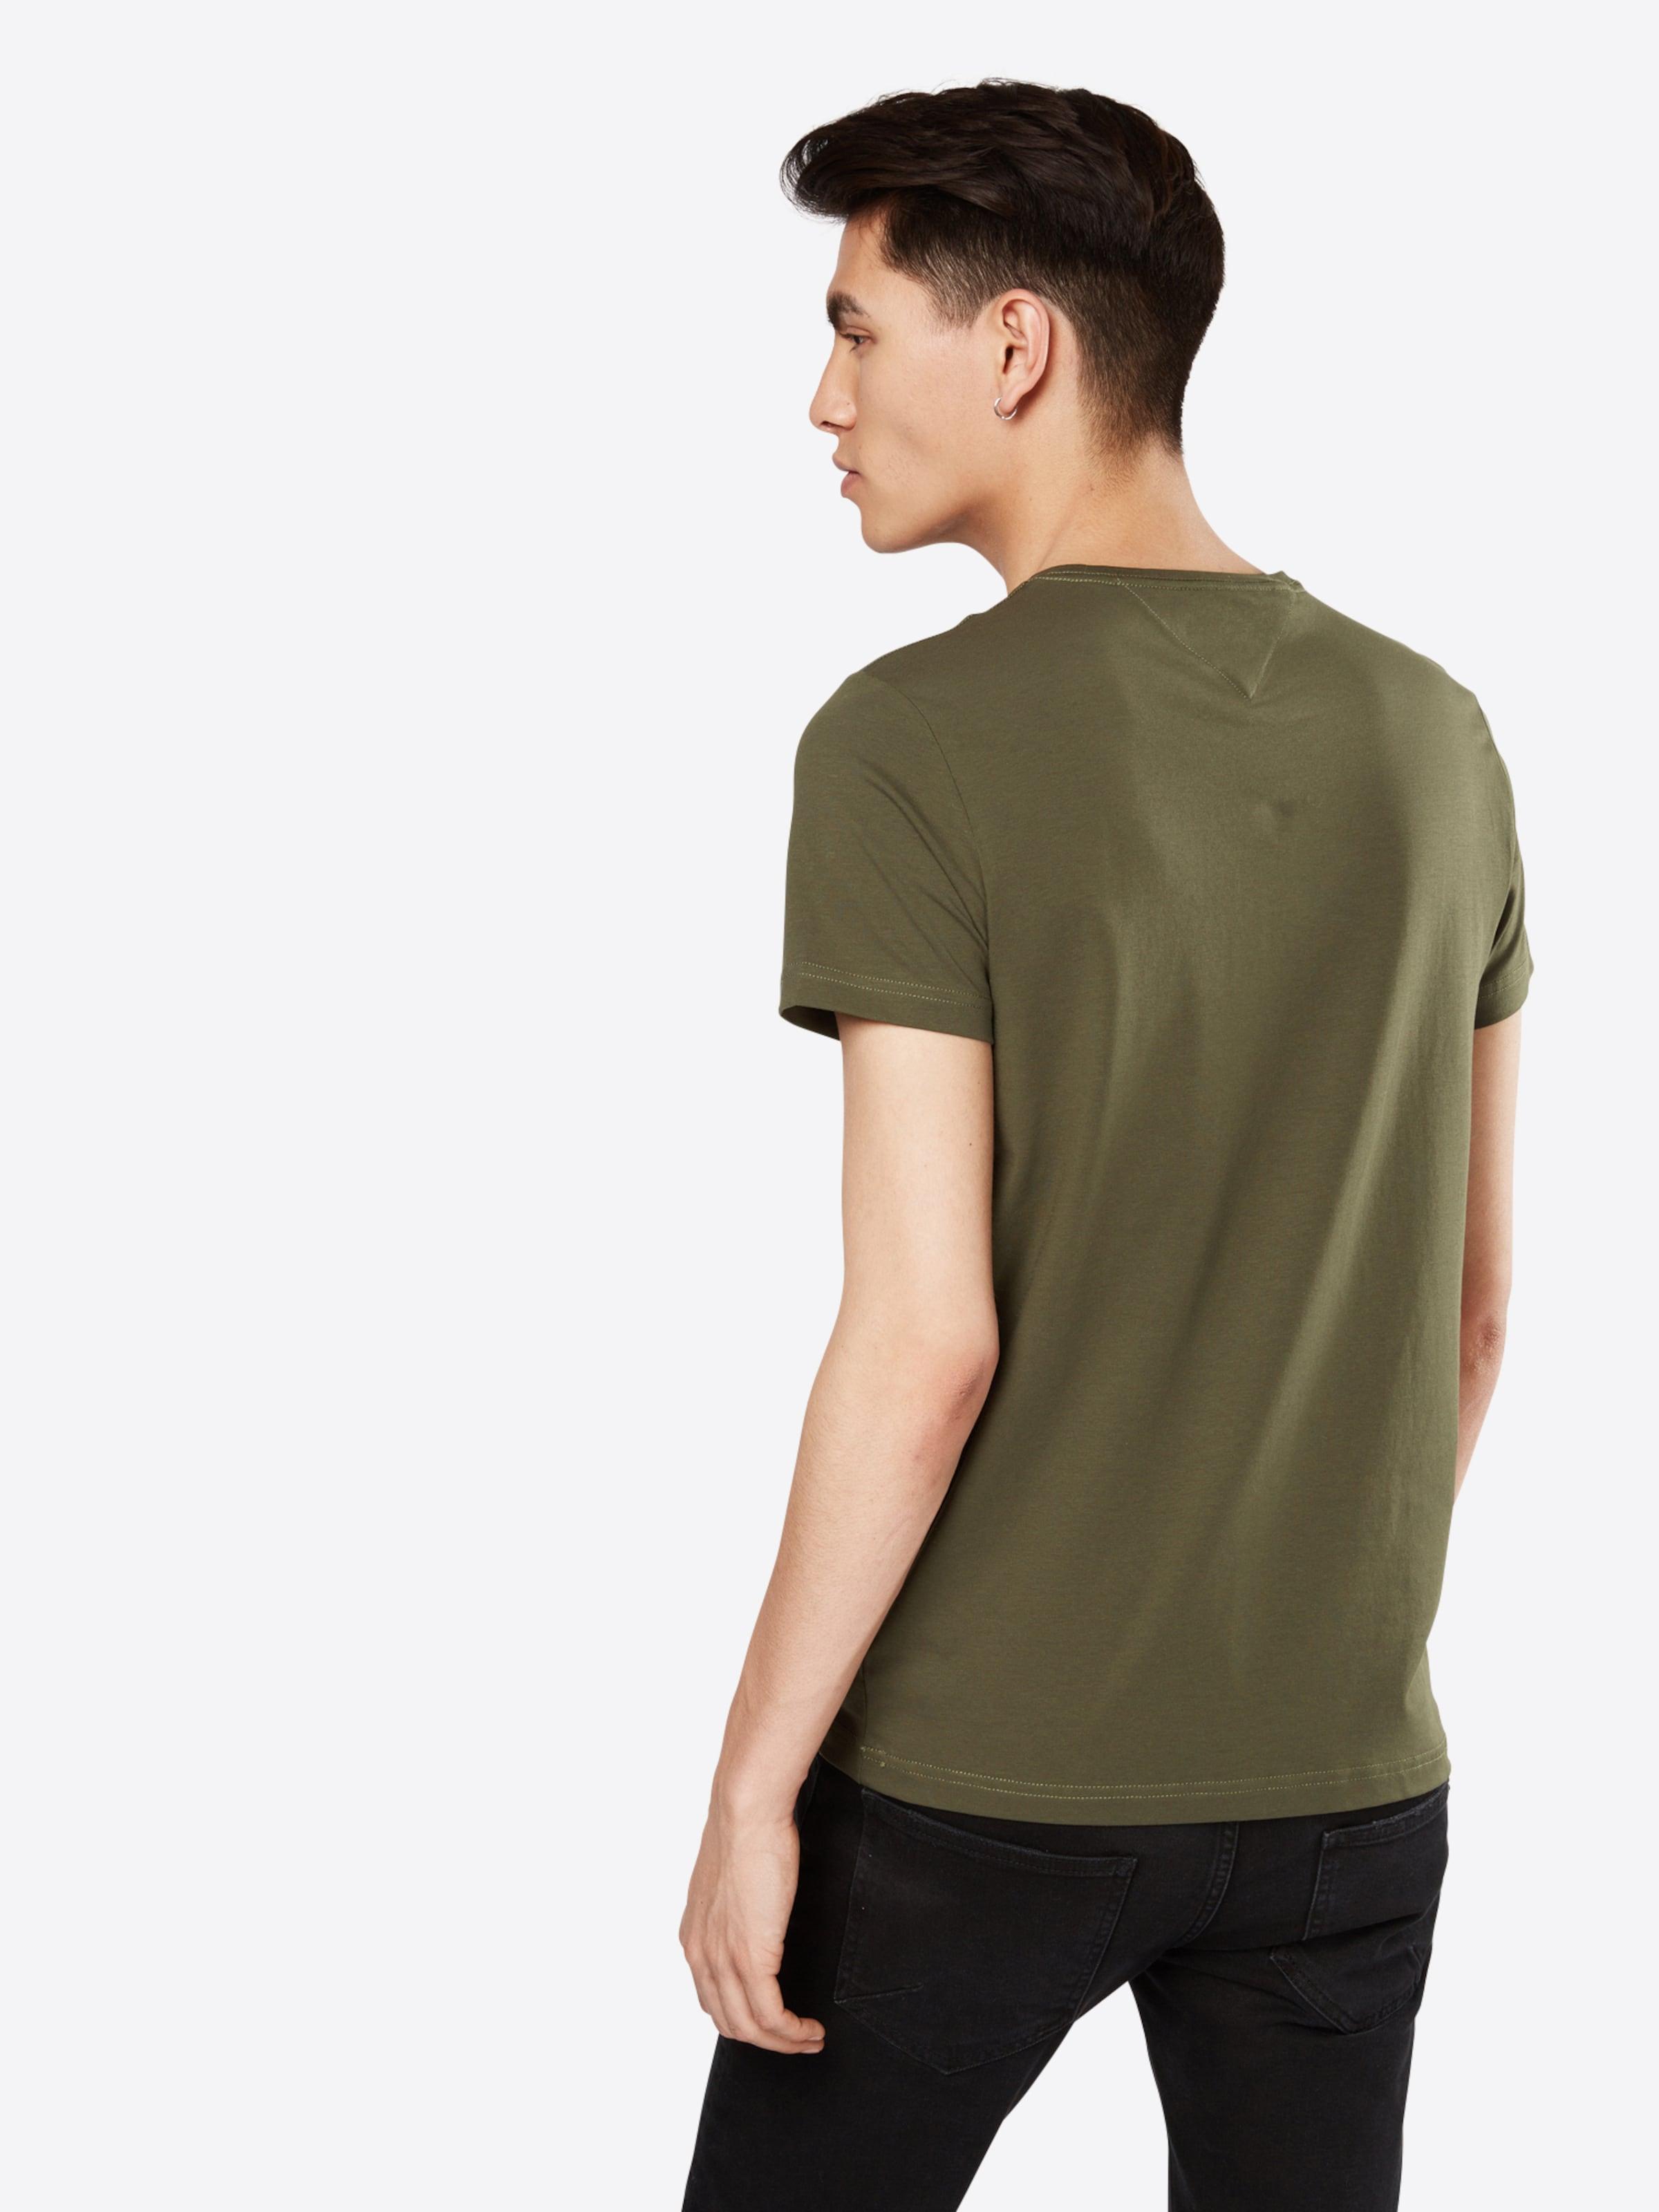 TOMMY HILFIGER T-Shirt 'STRETCH CNK TEE S/S SF' Verkauf 100% Original svSV4